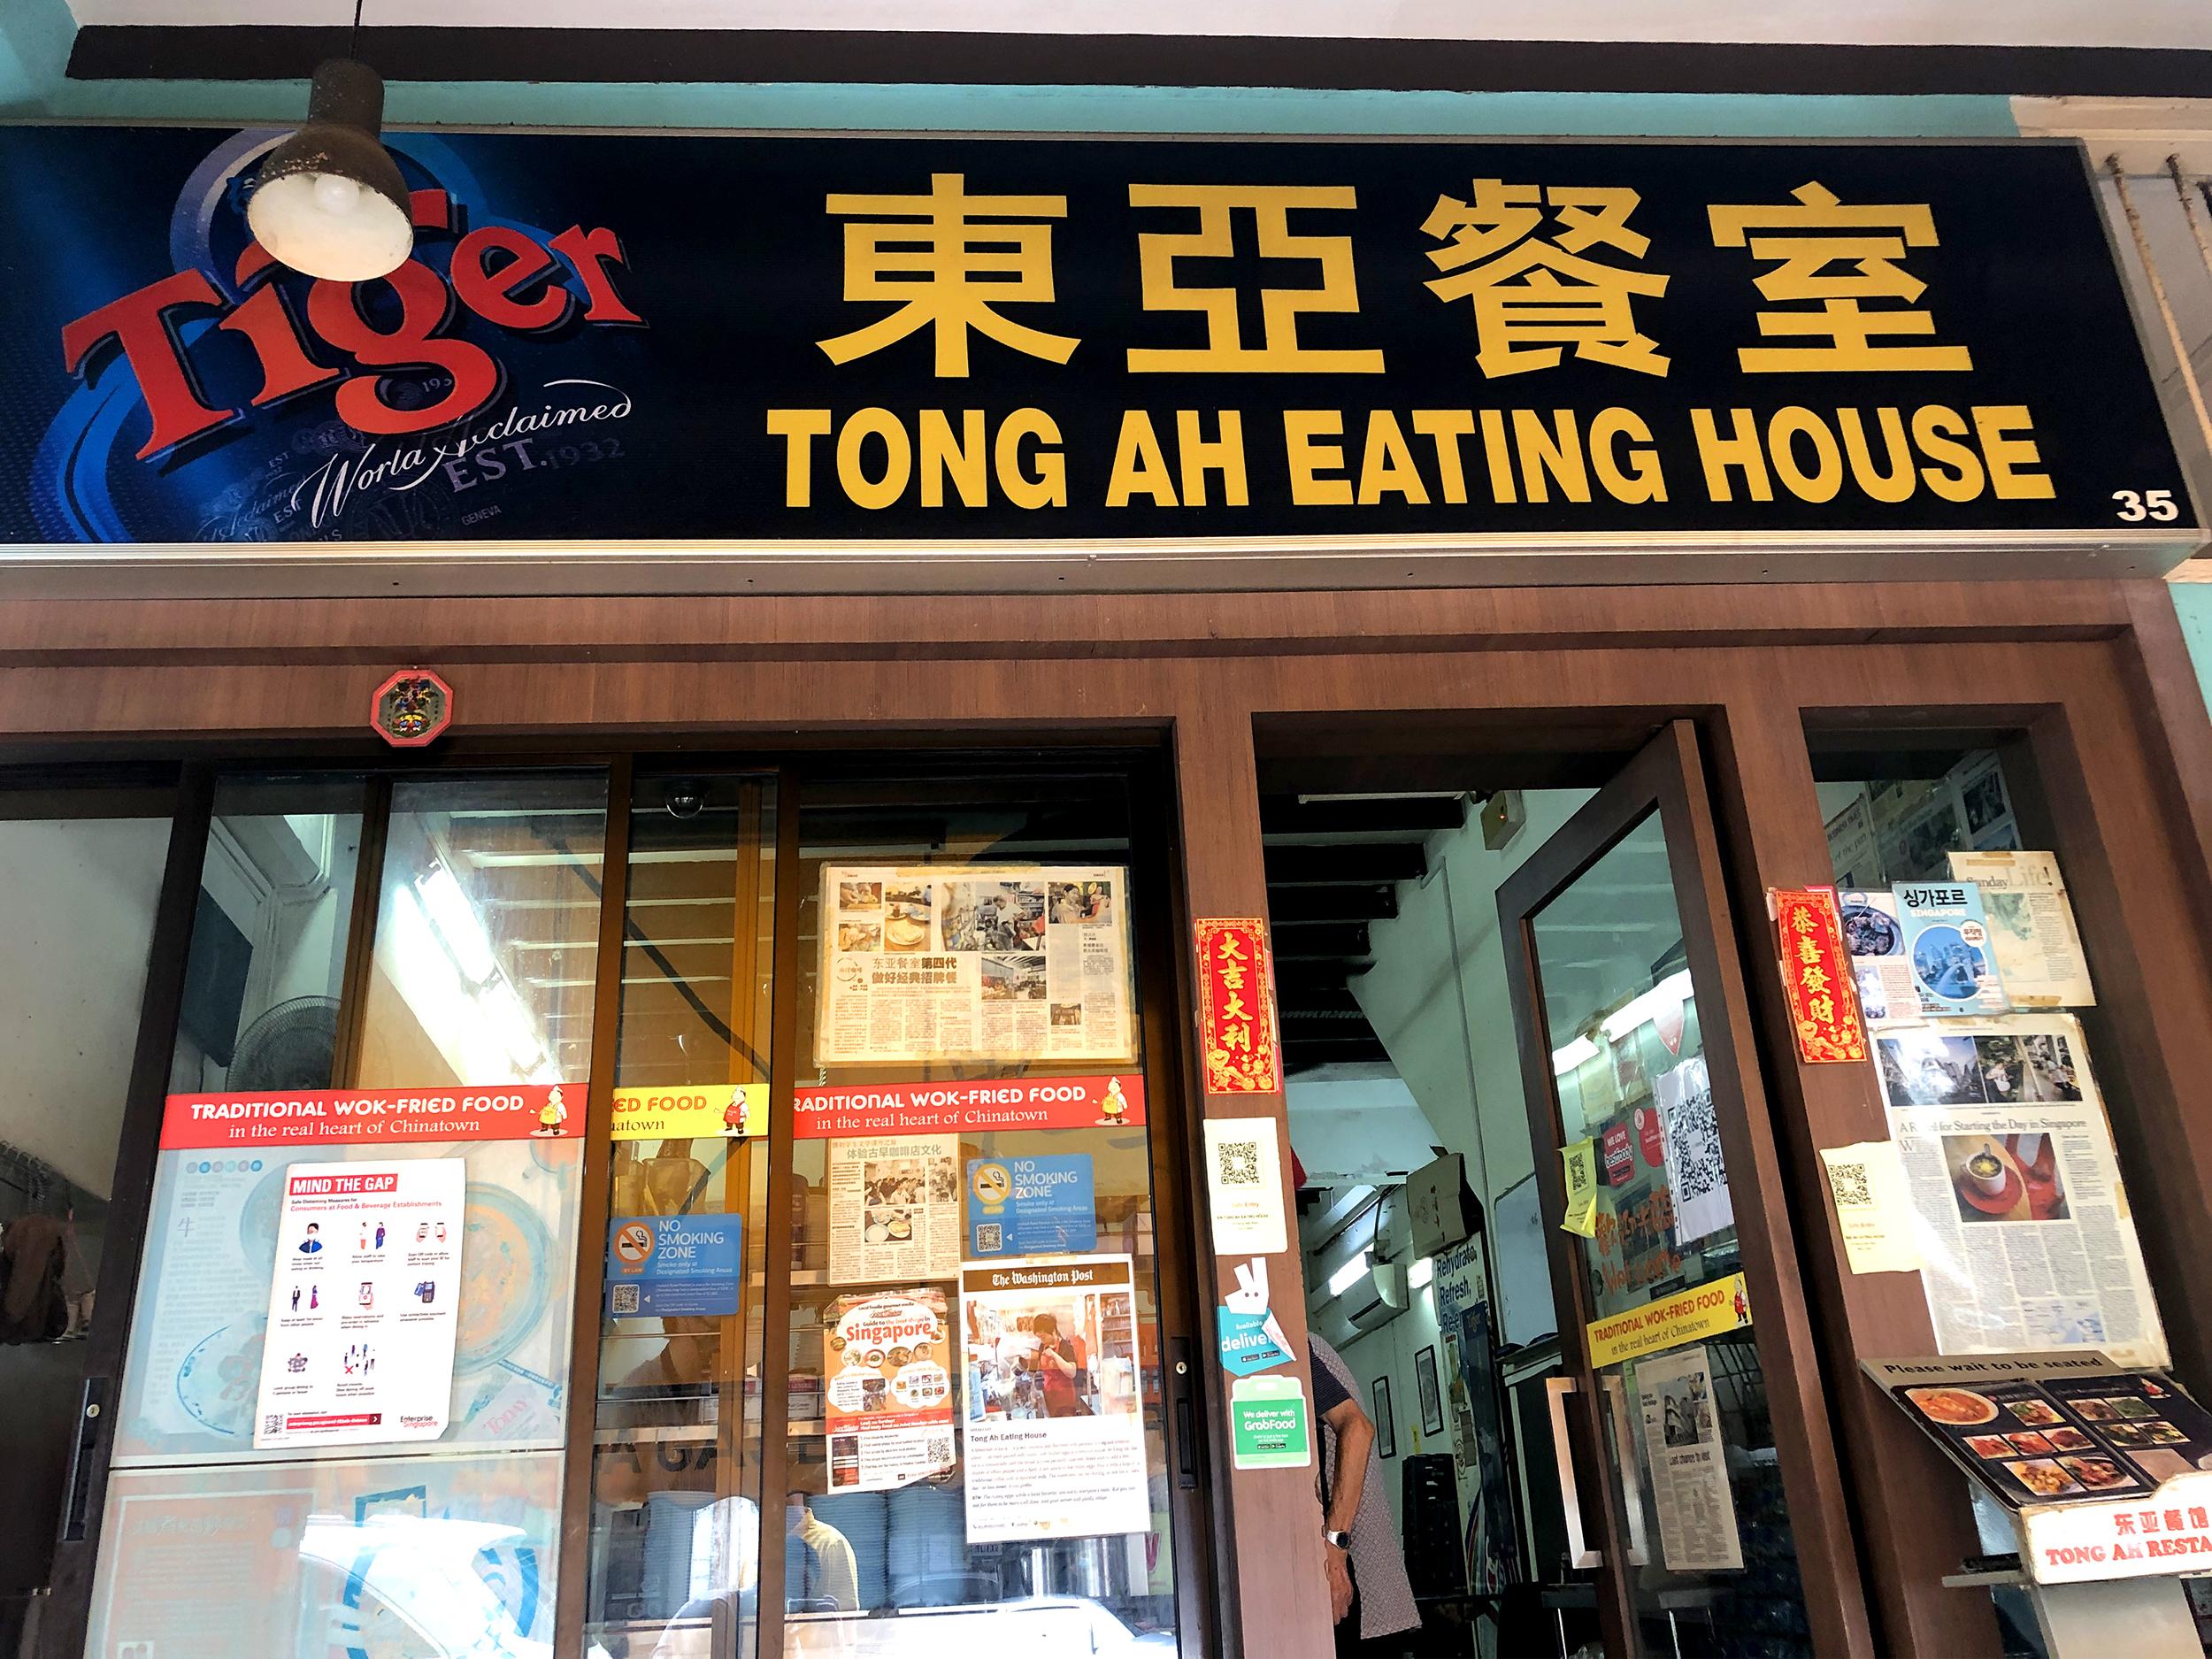 Try out Good Old Traditional Nanyang Kopi and Tze Char at Tong Ah Eating House